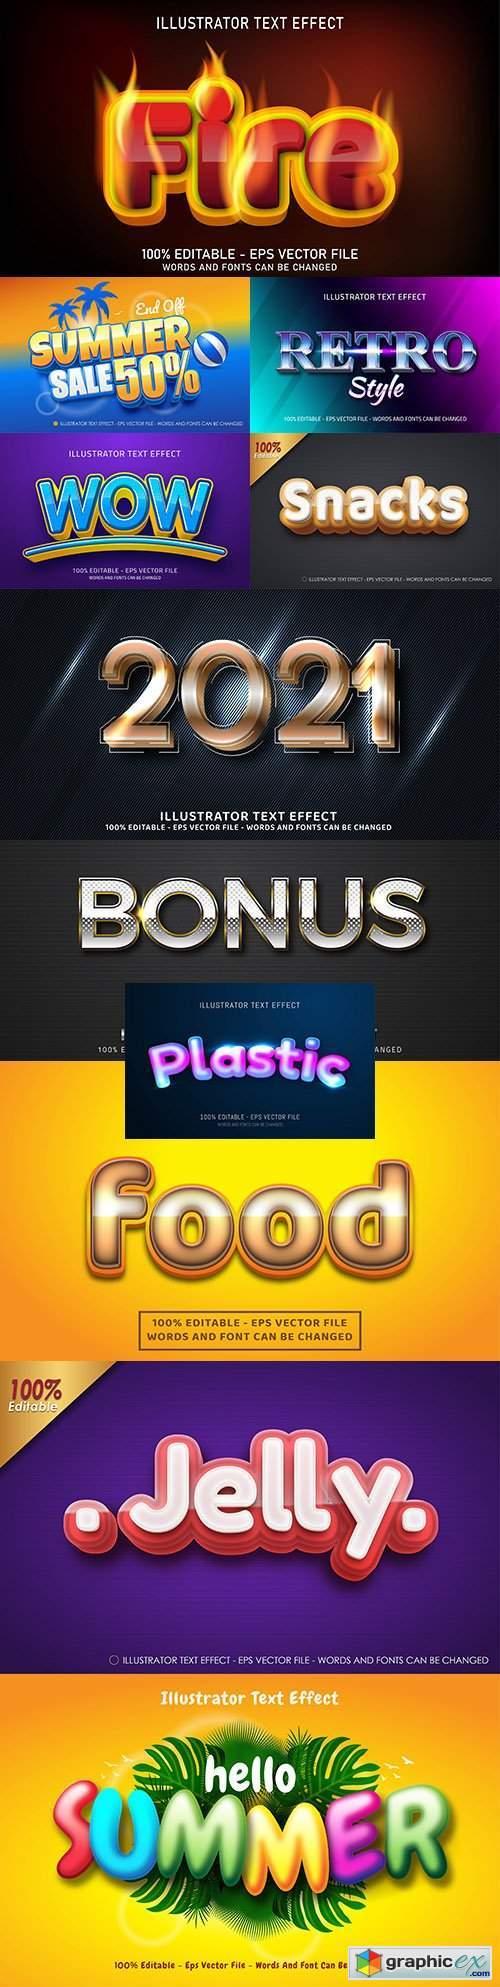 Editable font effect text collection illustration design 184